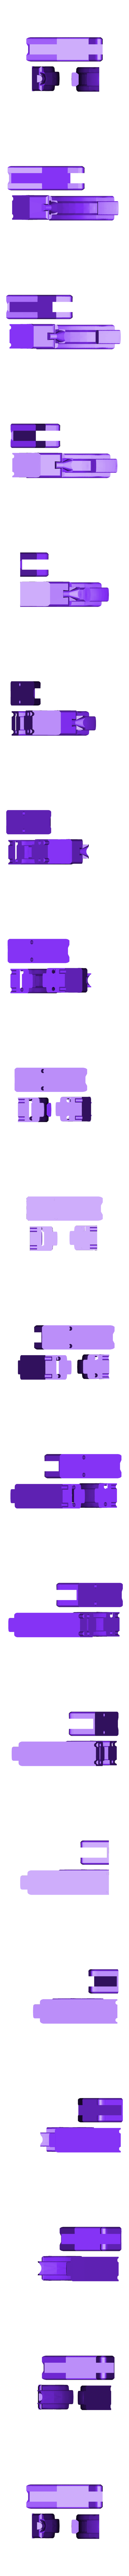 Lightcycle_Body.STL Download free STL file Lightcycle Model Kit • Design to 3D print, billythemighty3Dprinter